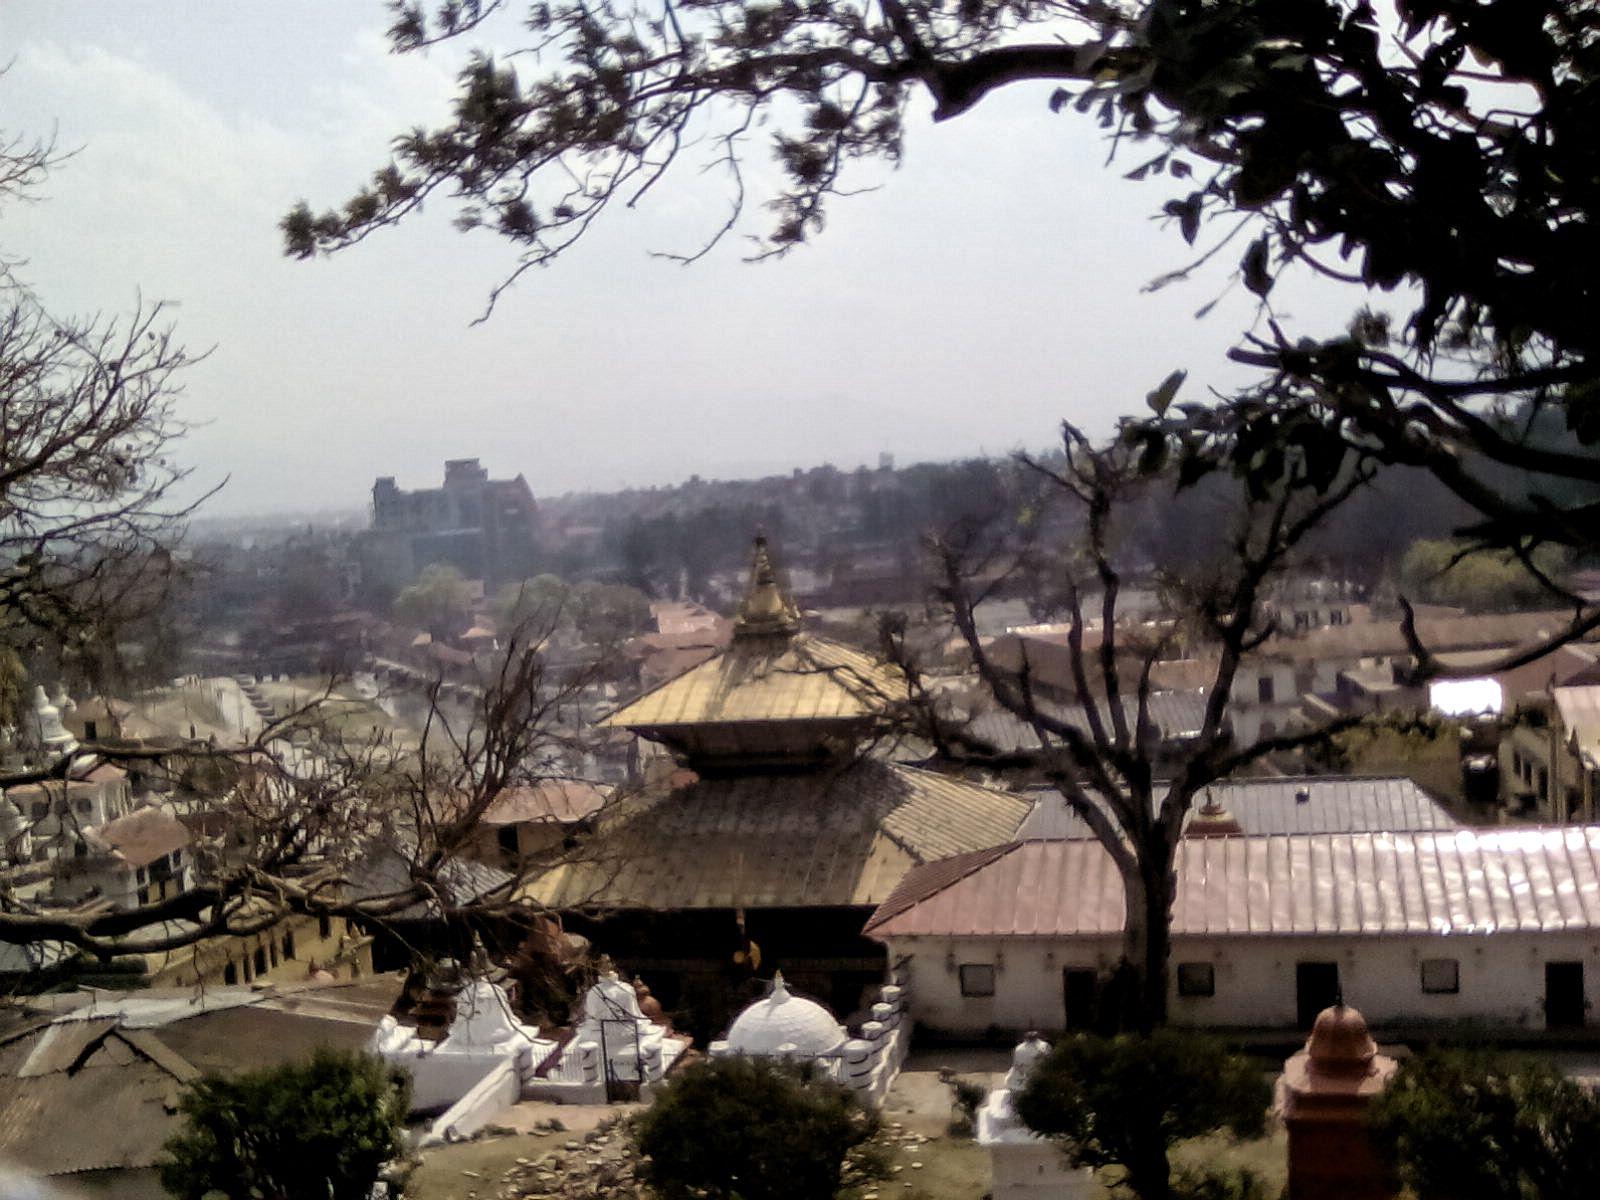 pashupatinath temple katmandou nepal hindouisme arnaque